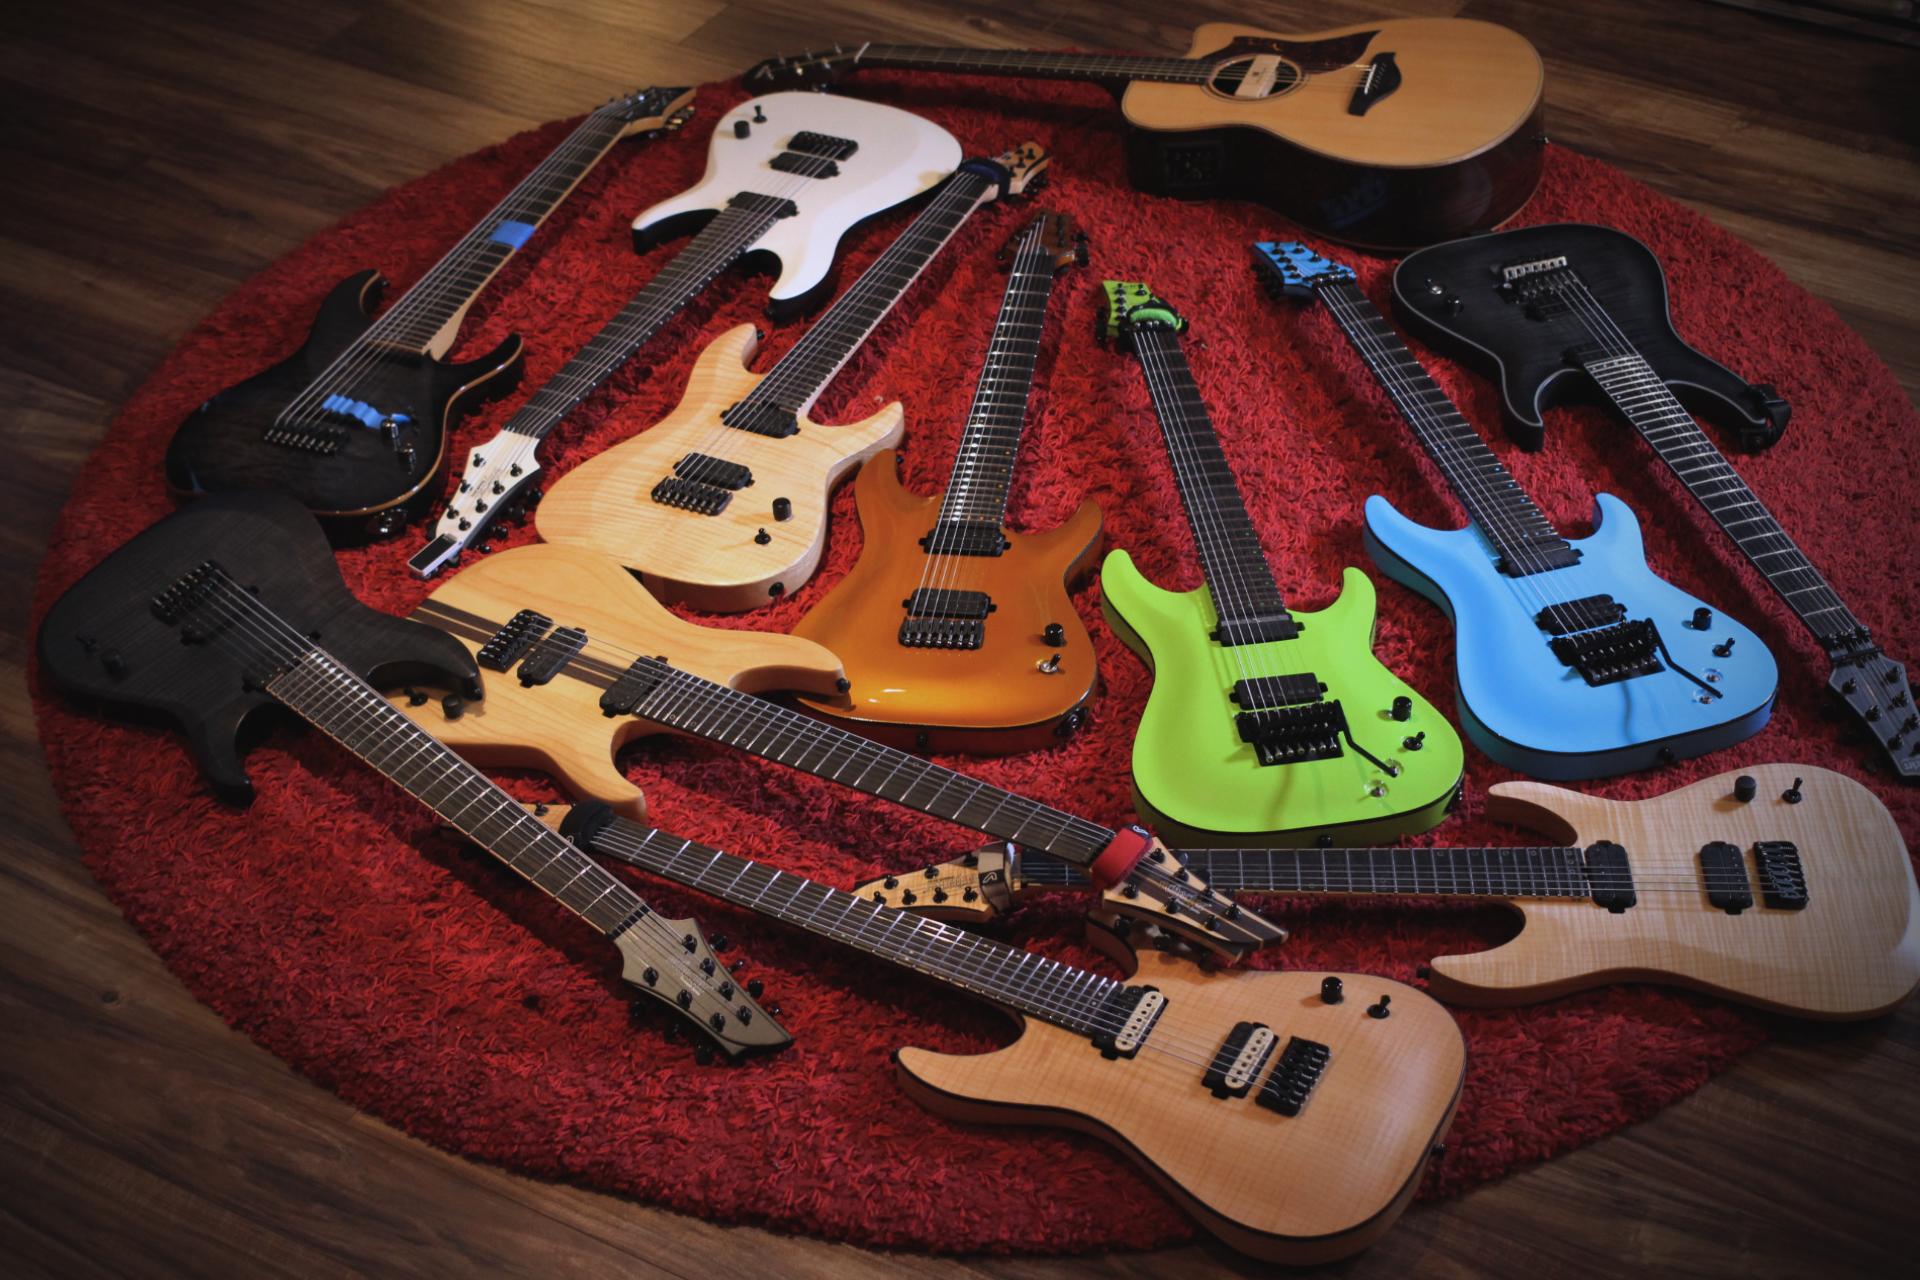 Keith Merrow Guitars